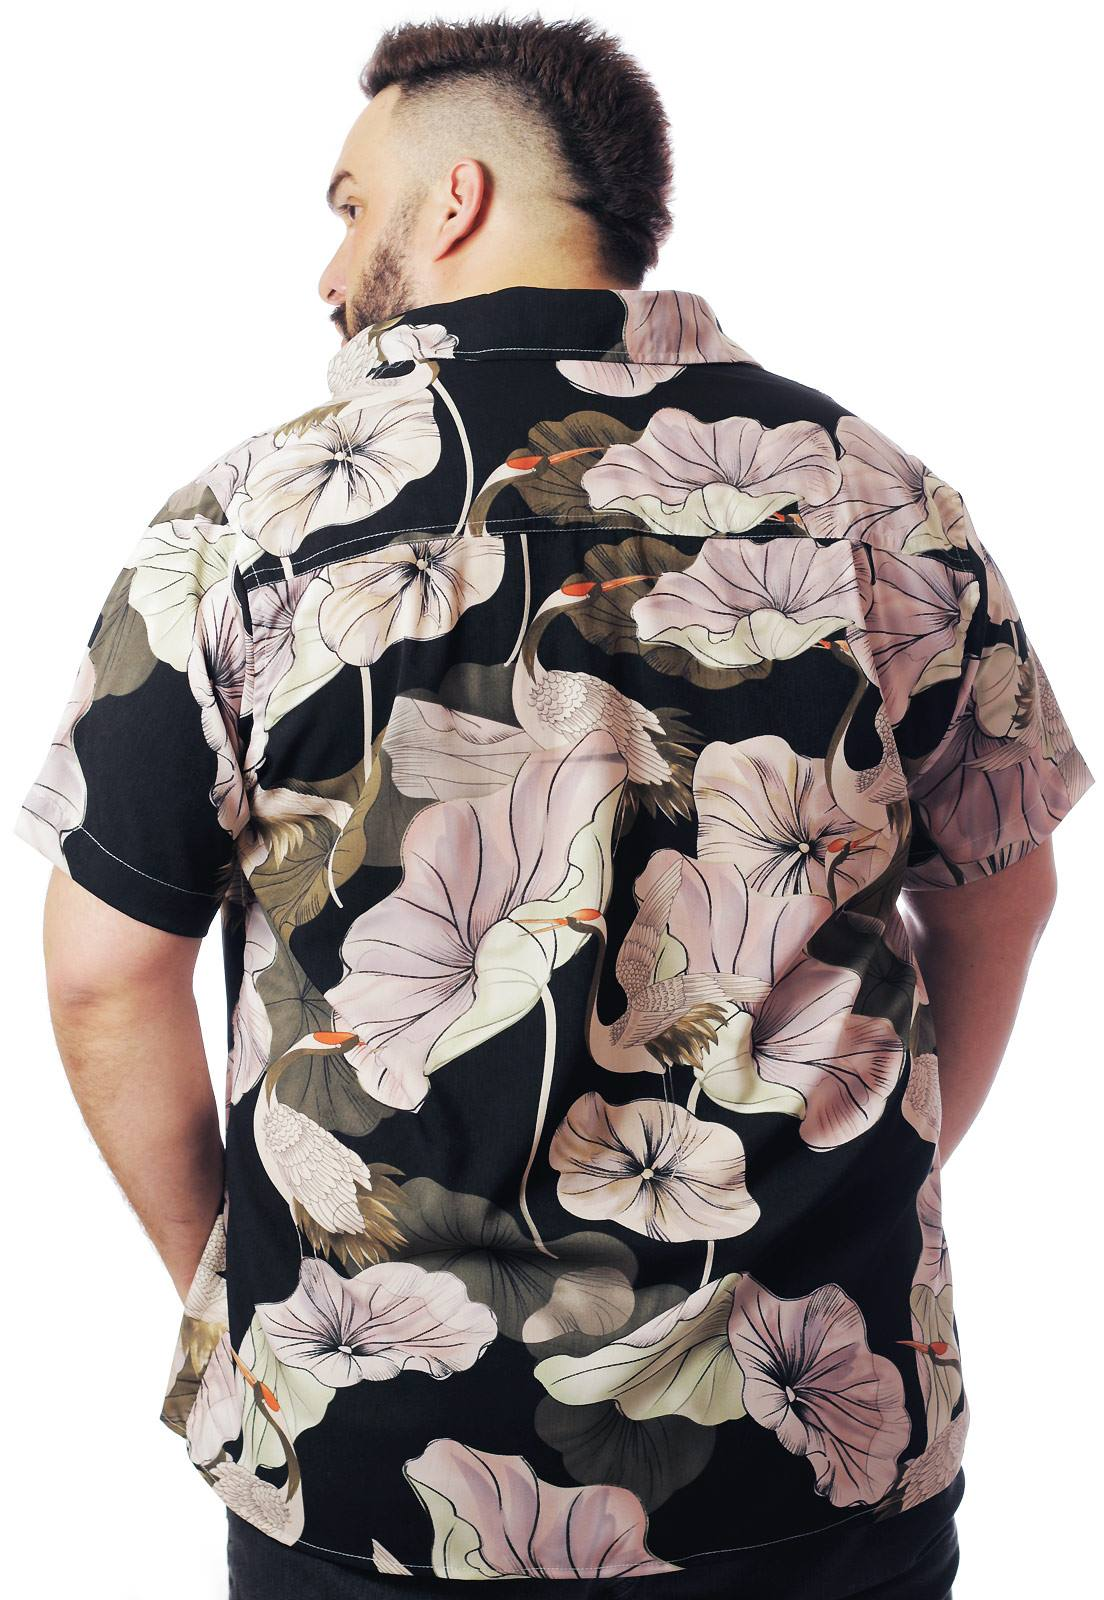 Camisa Plus Size Estampada Viscose Cherry Pop Cisne (P Ao Plus Size)